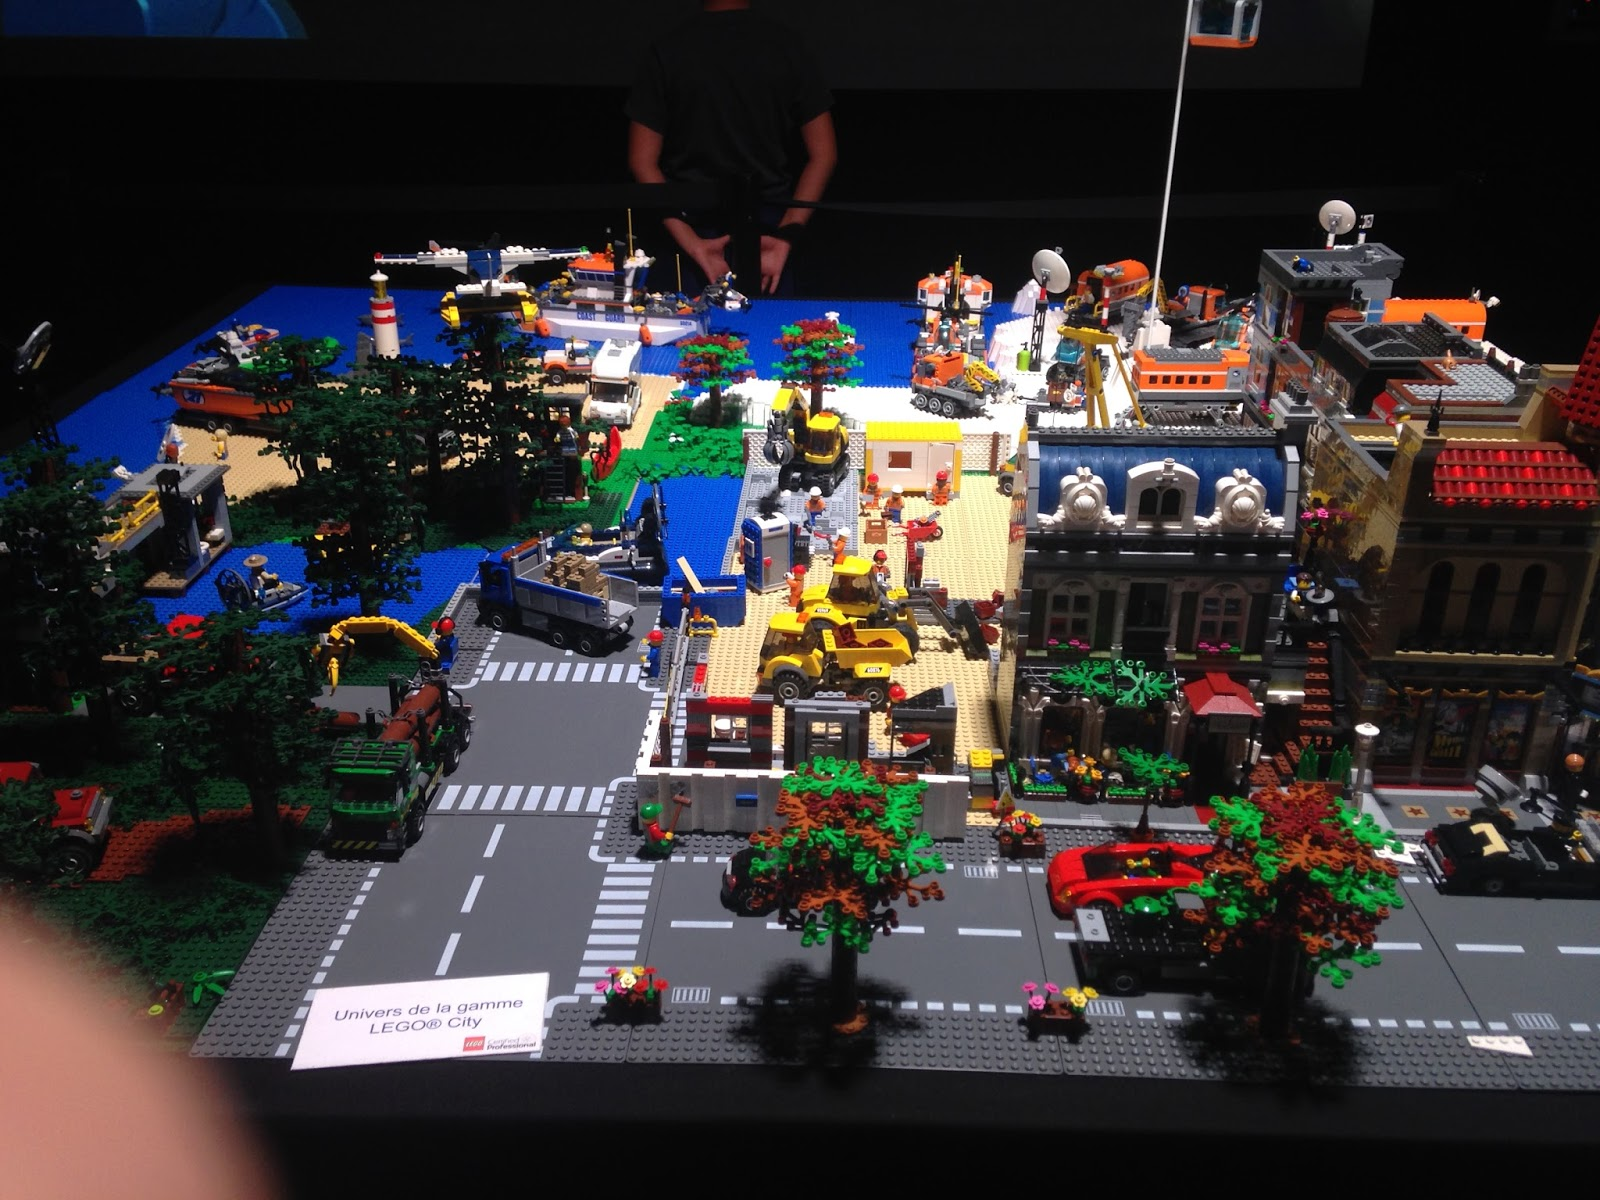 Univers de la gamme Lego City